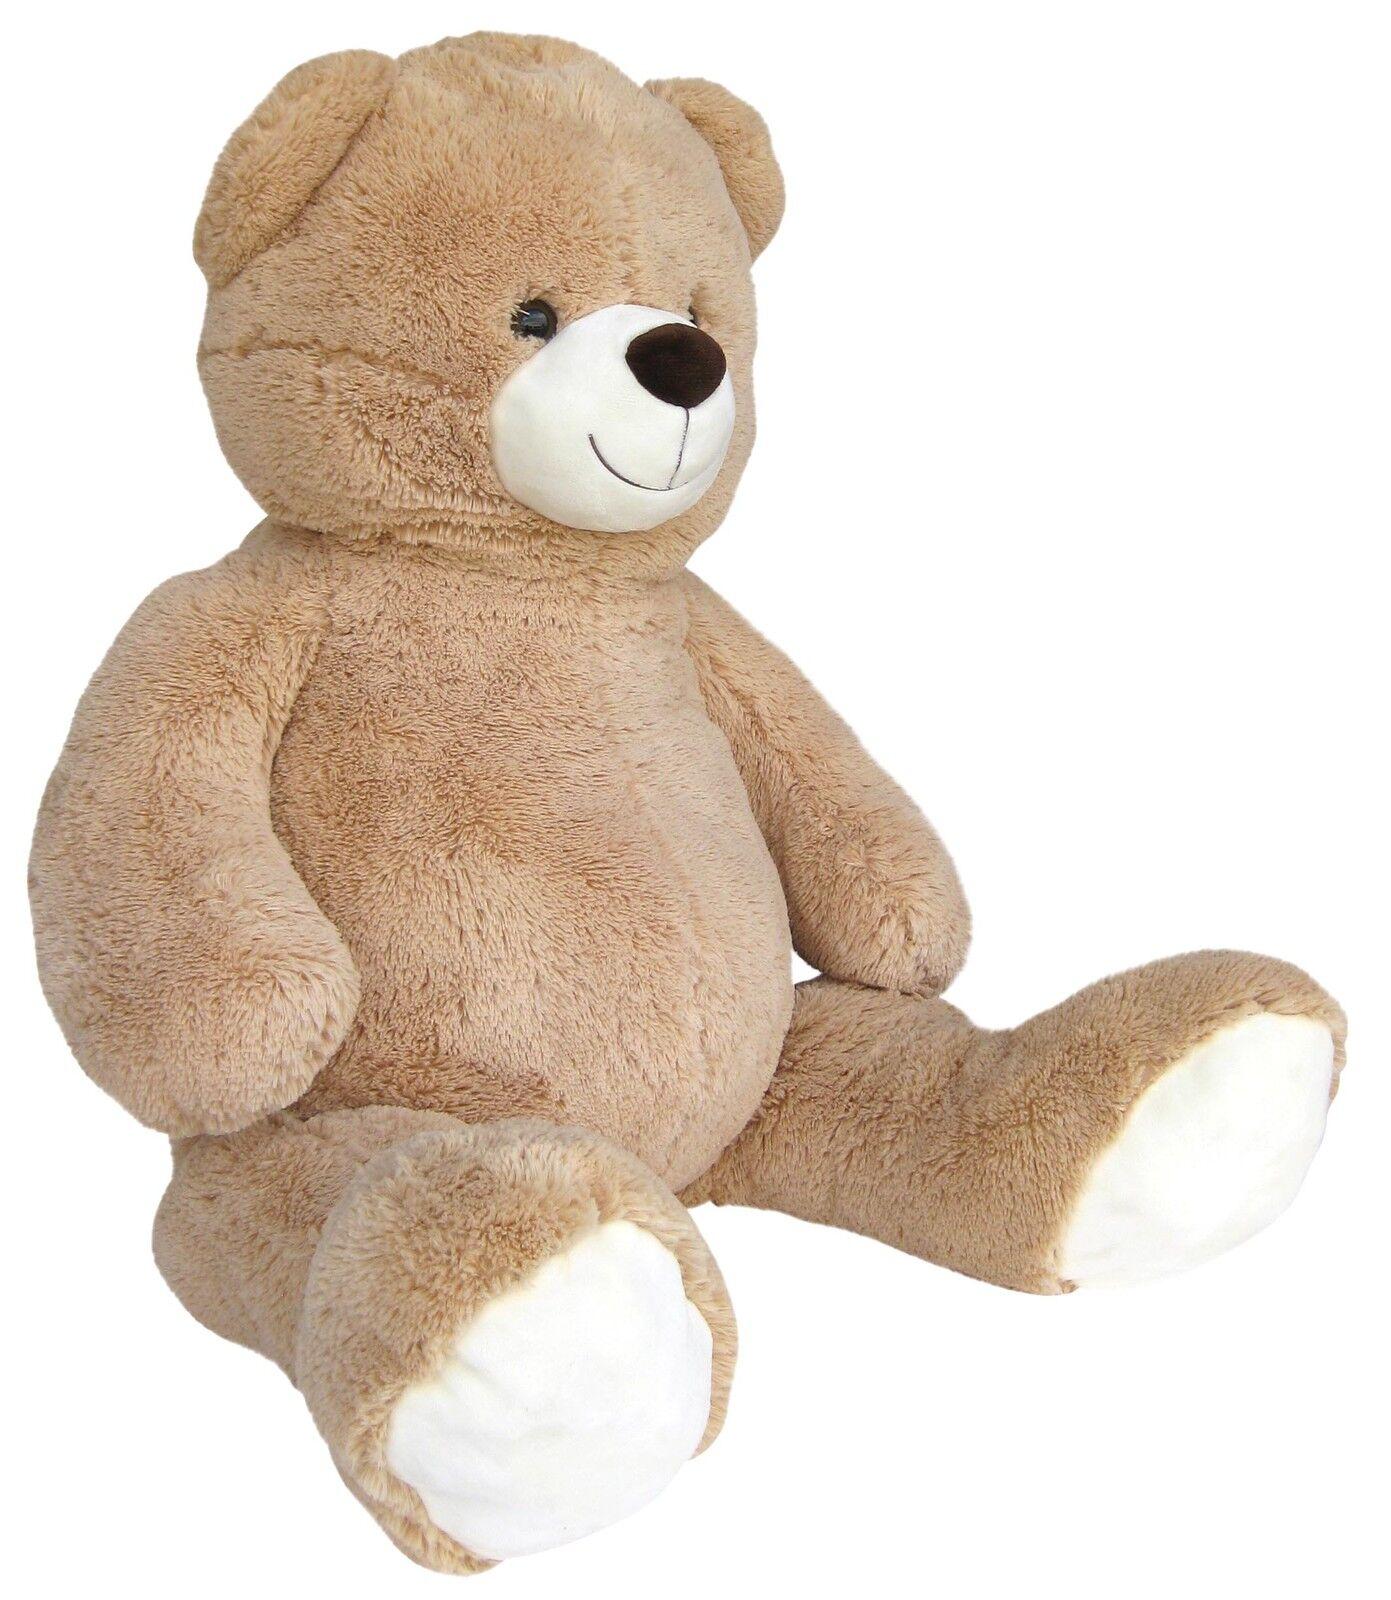 xxl teddyb r 140cm gross beige pl schb r teddy stoffb r pl sch pl schtier b r eur 64 95. Black Bedroom Furniture Sets. Home Design Ideas